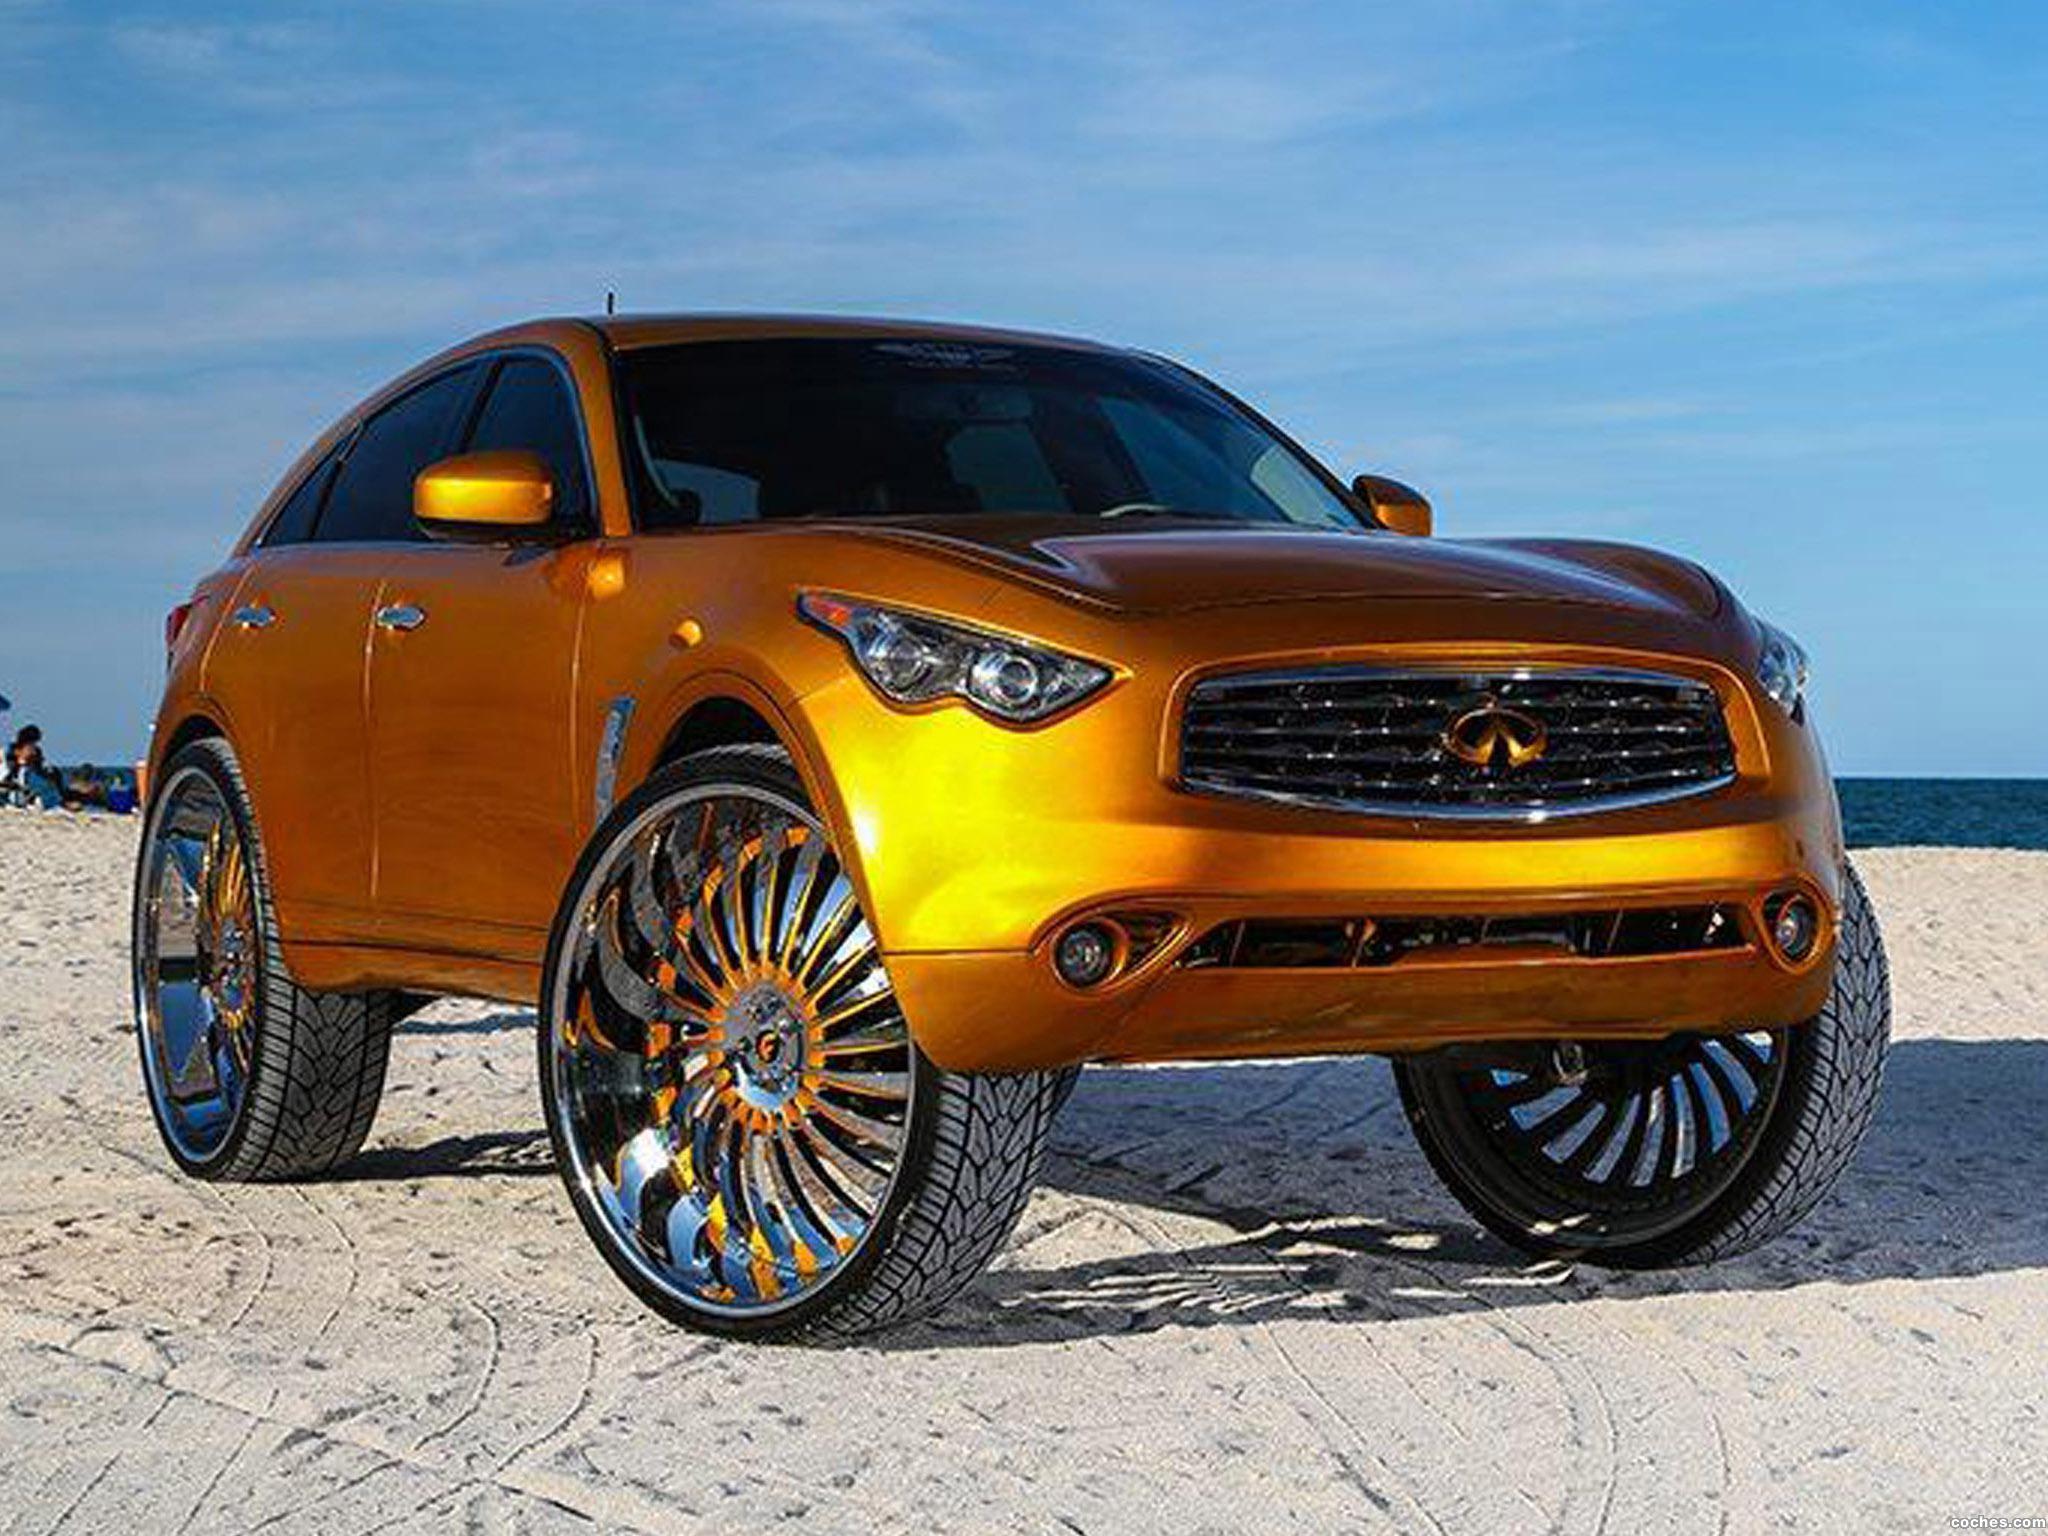 infiniti_fx-with-32-inch-wheels-2015_r4.jpg